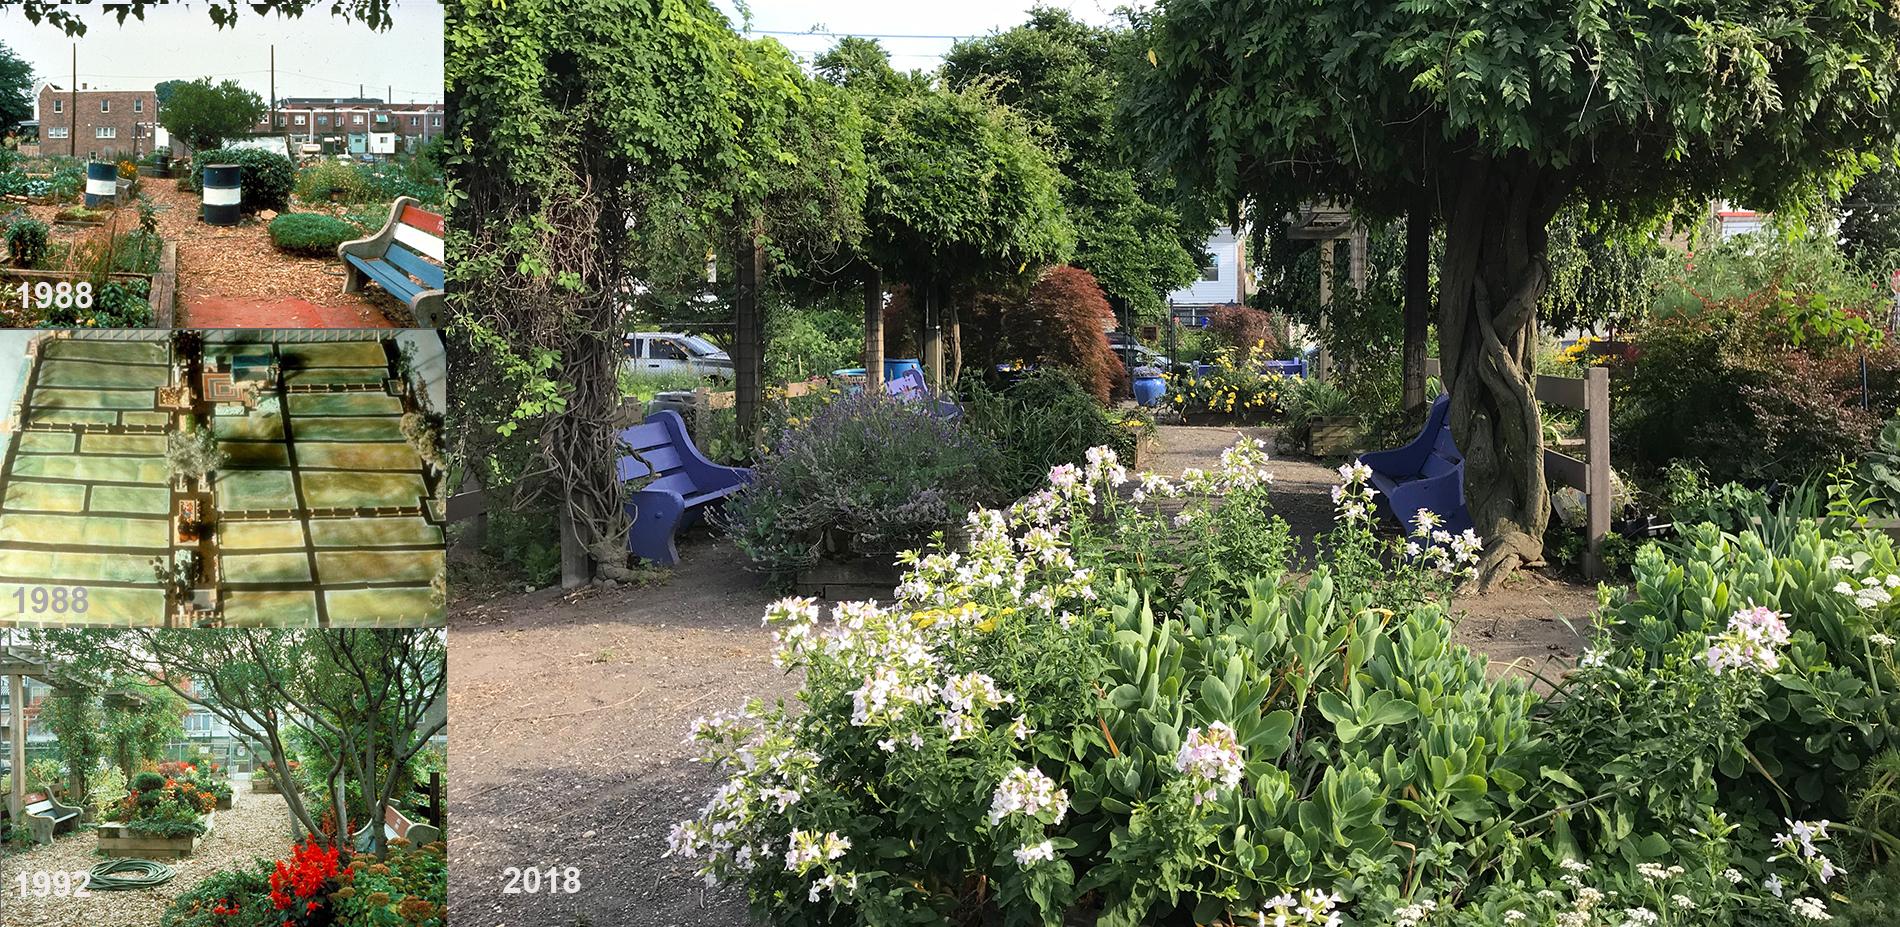 Designing a Framework for Action: Aspen Farms Community Garden (1988-Present)